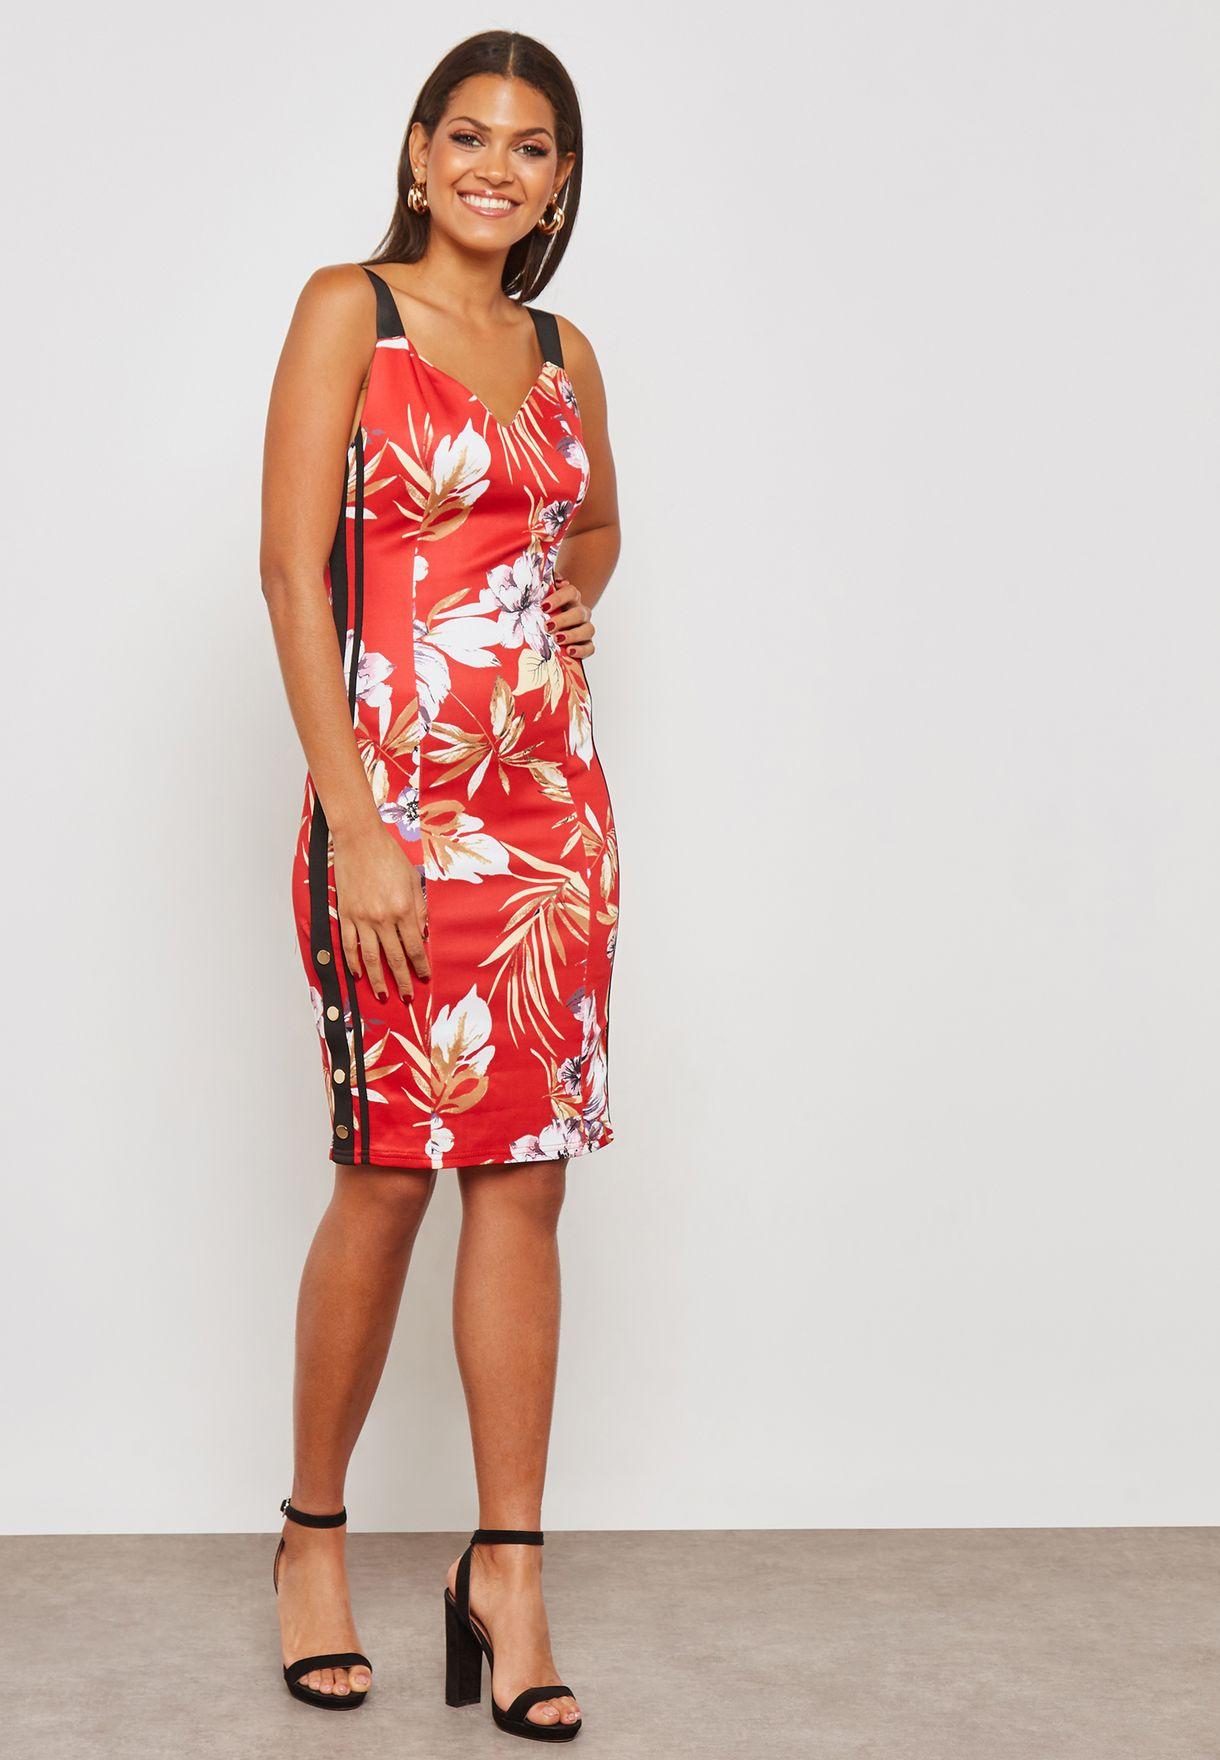 فستان بطبعات ازهار